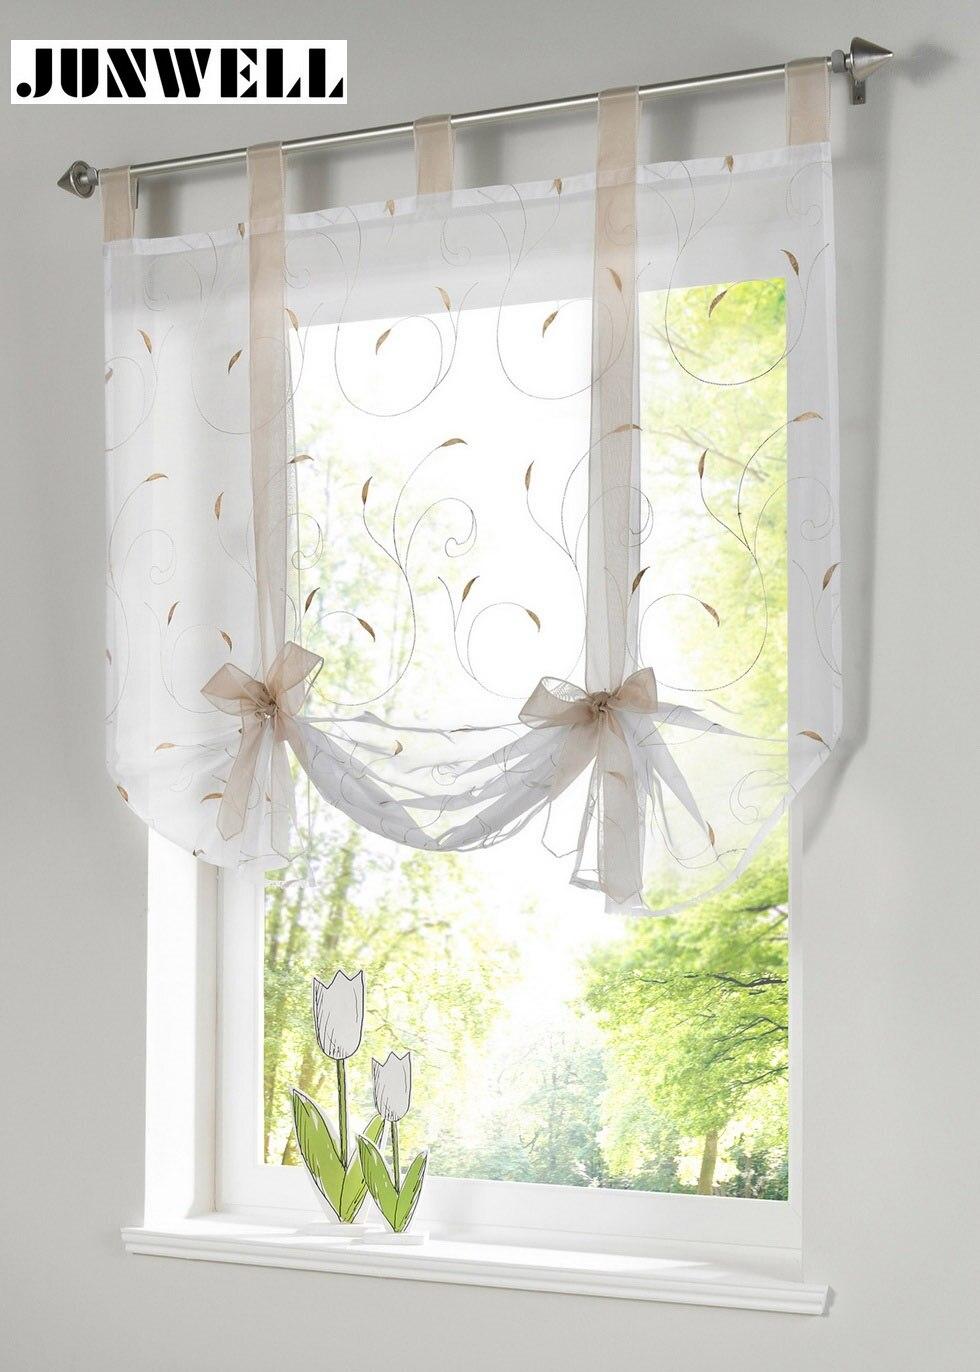 Cortina romana bordado europeo estilo tie up ventana cortina de la ...